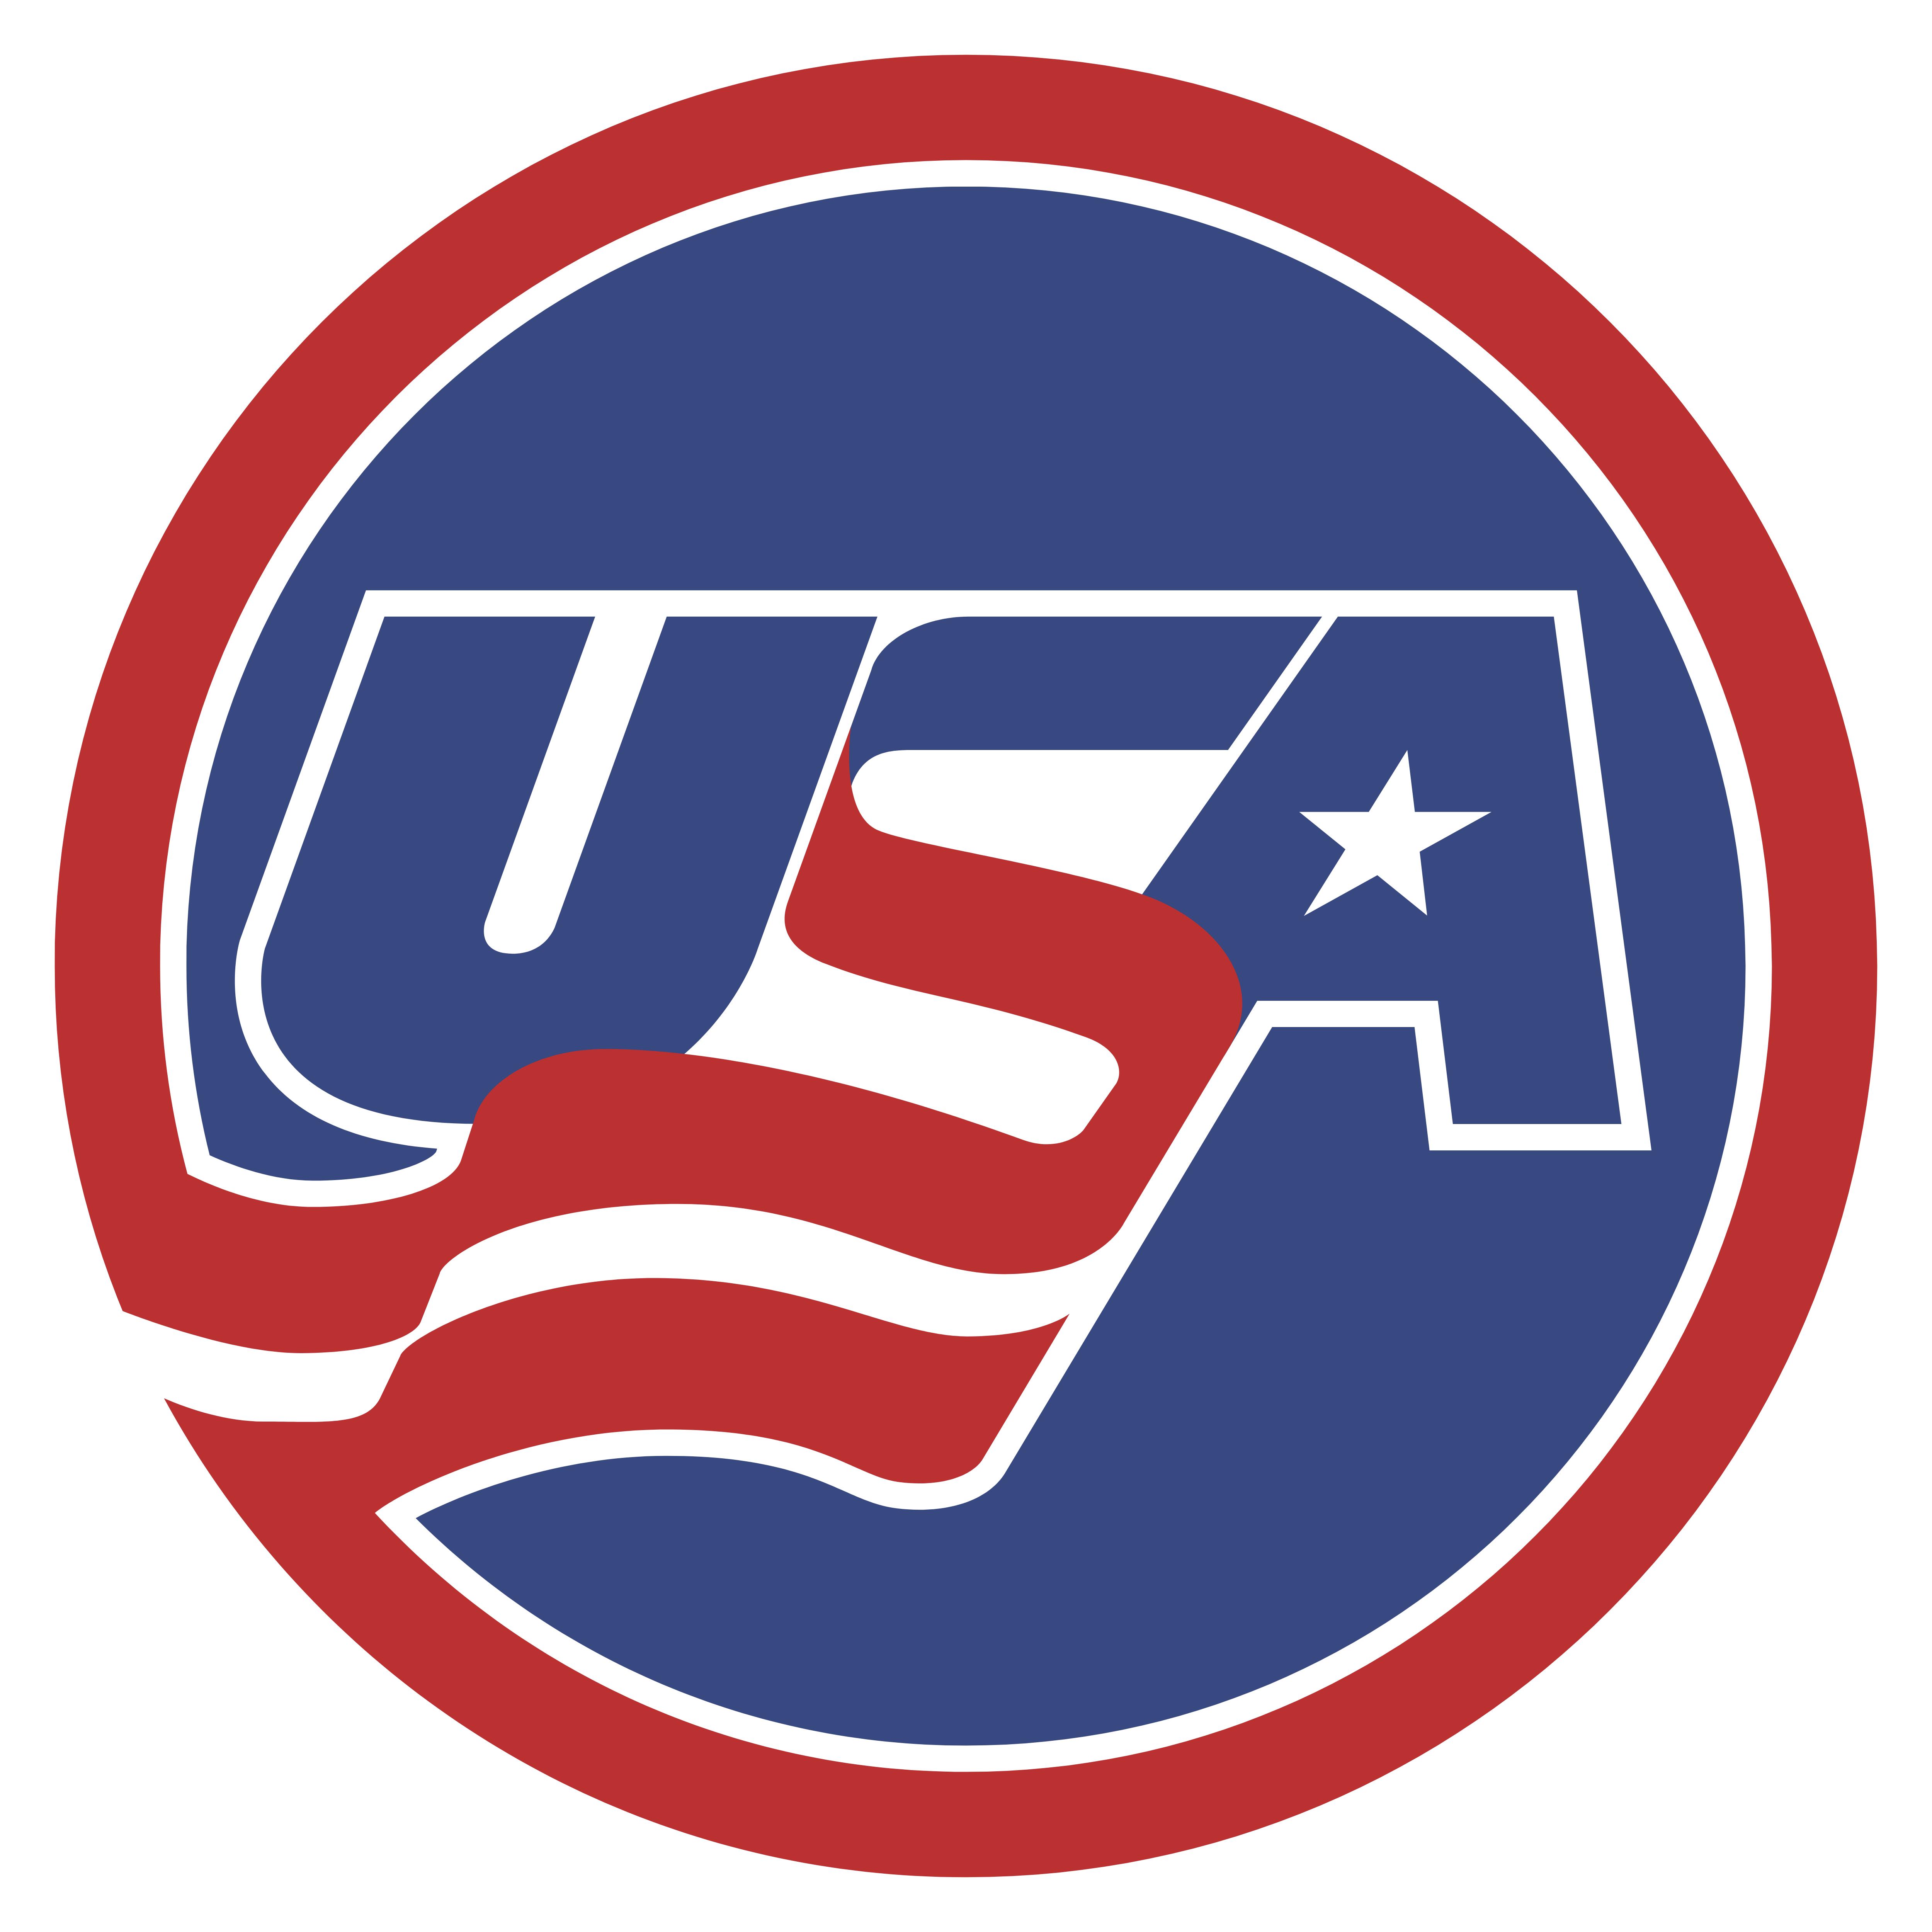 Usa Hockey Logos Download